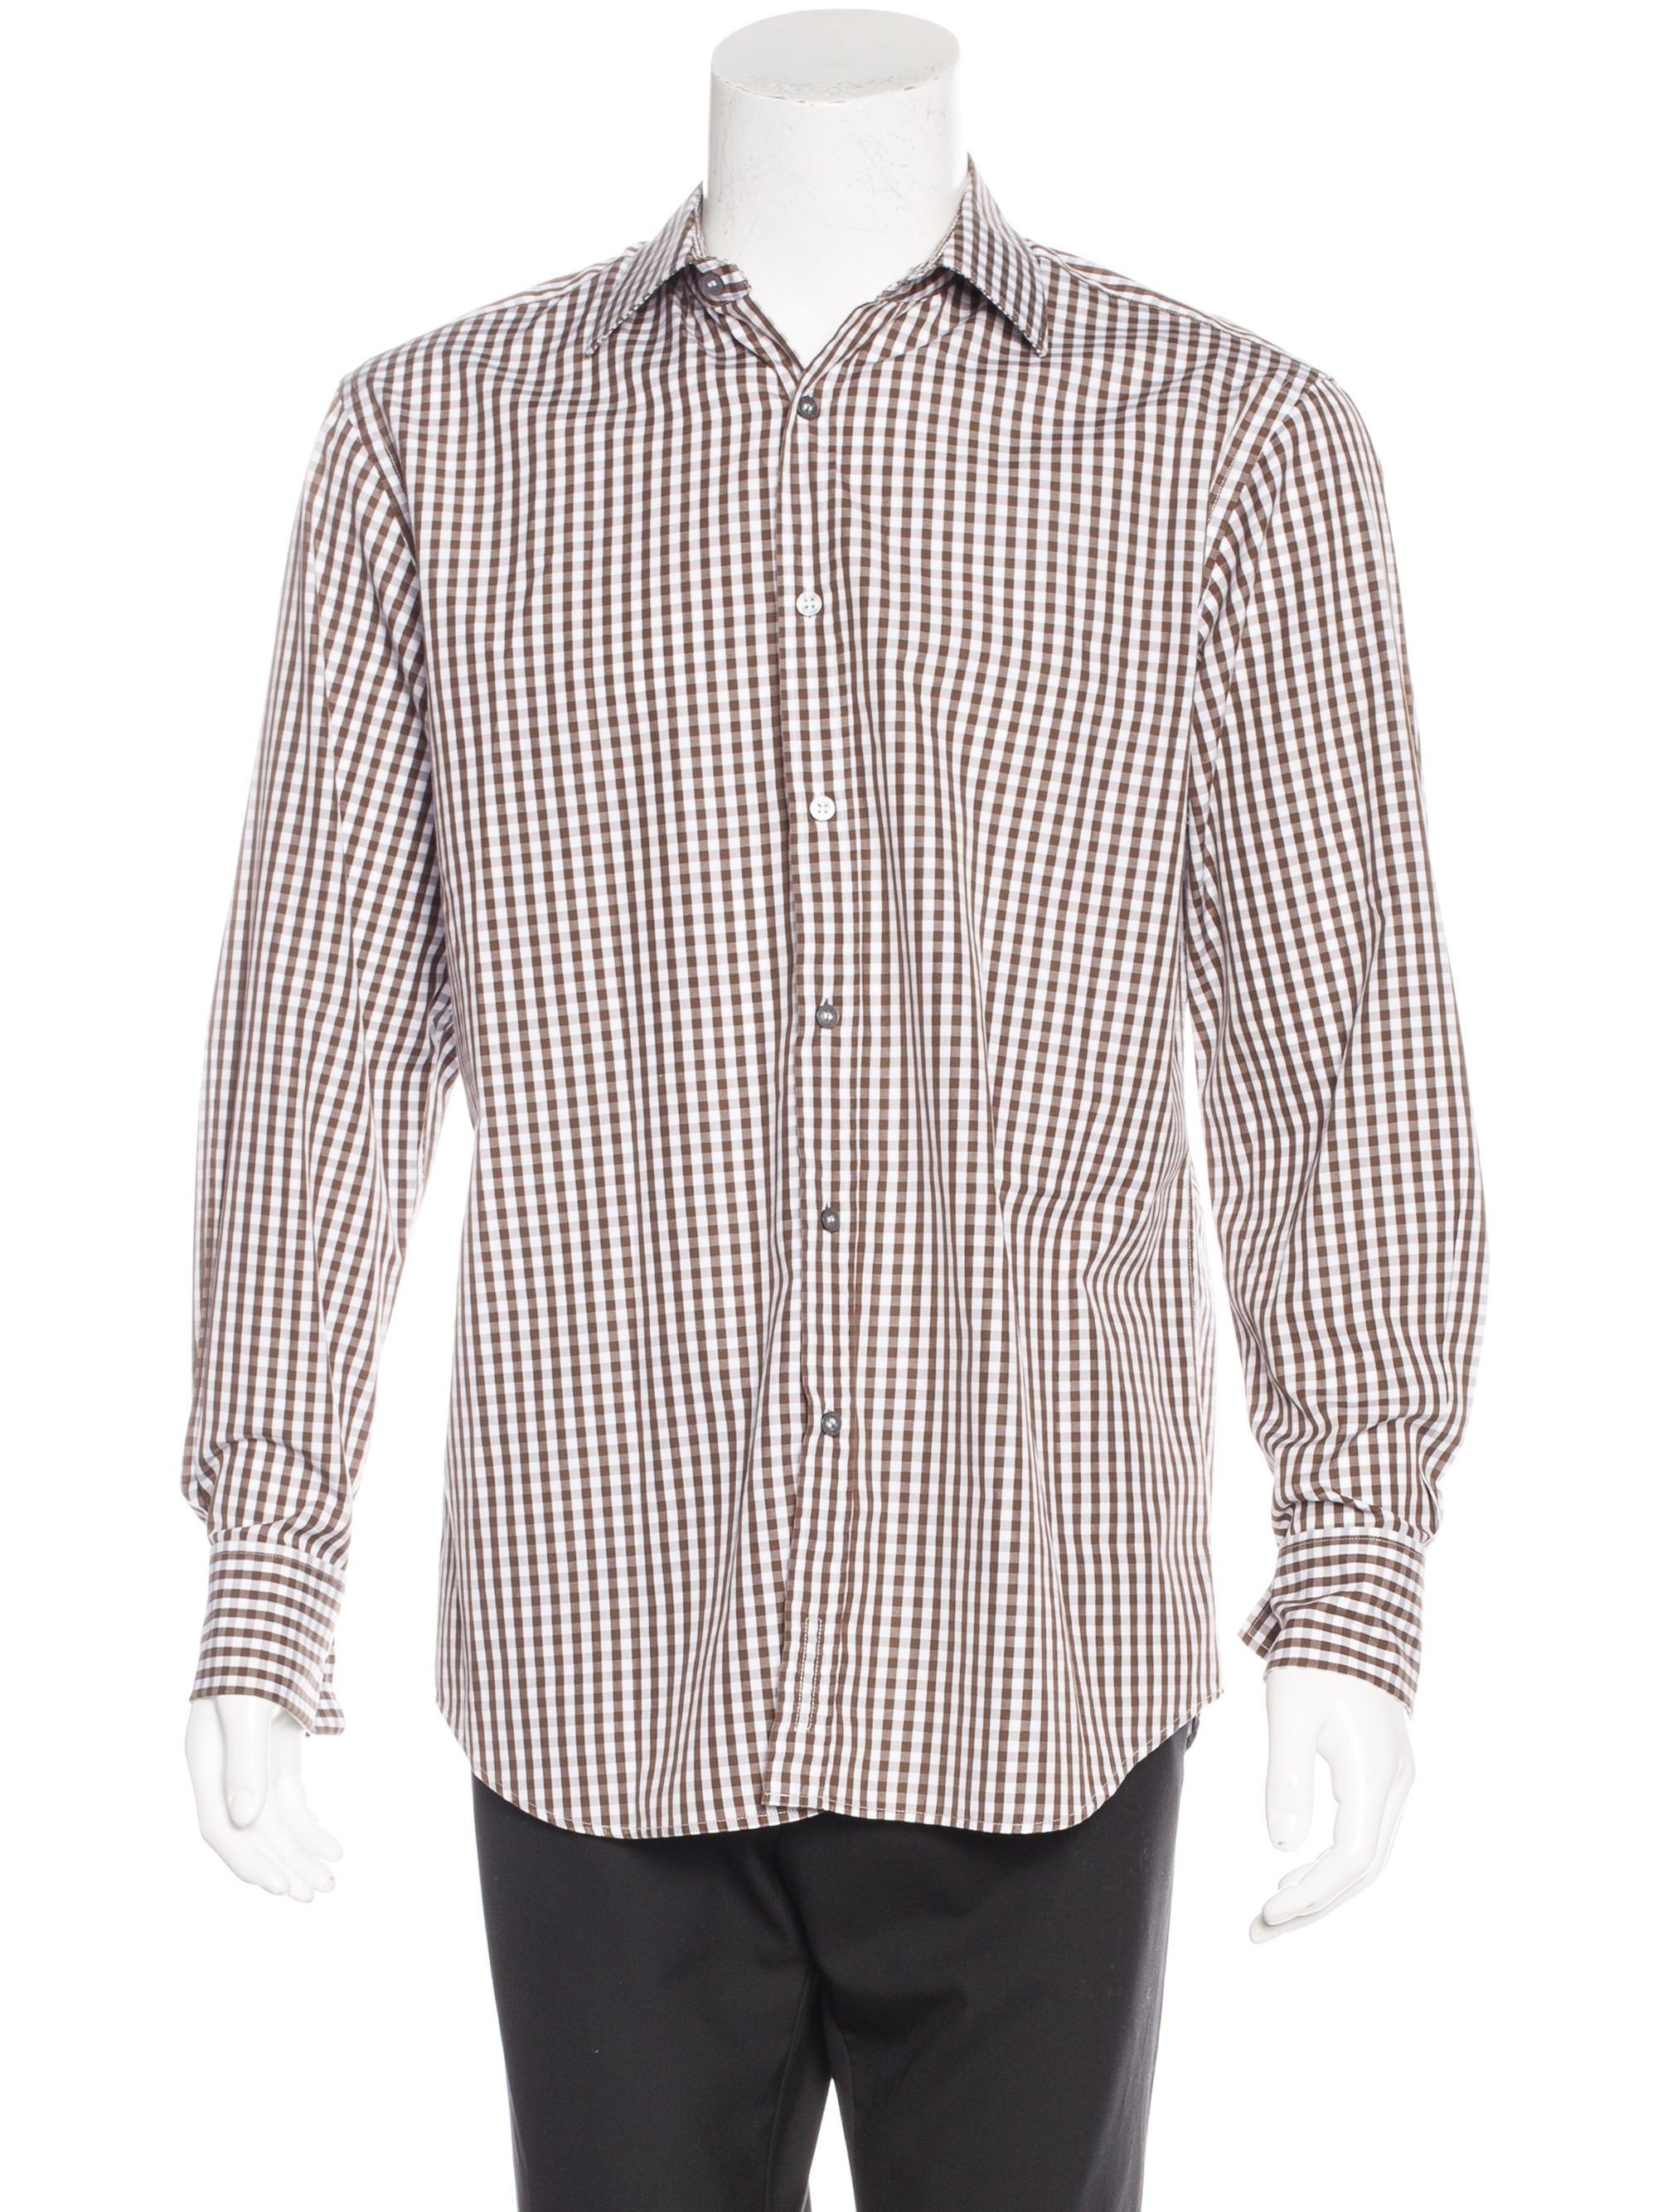 Paul smith gingham dress shirt clothing wps23557 the for Men s red gingham dress shirt